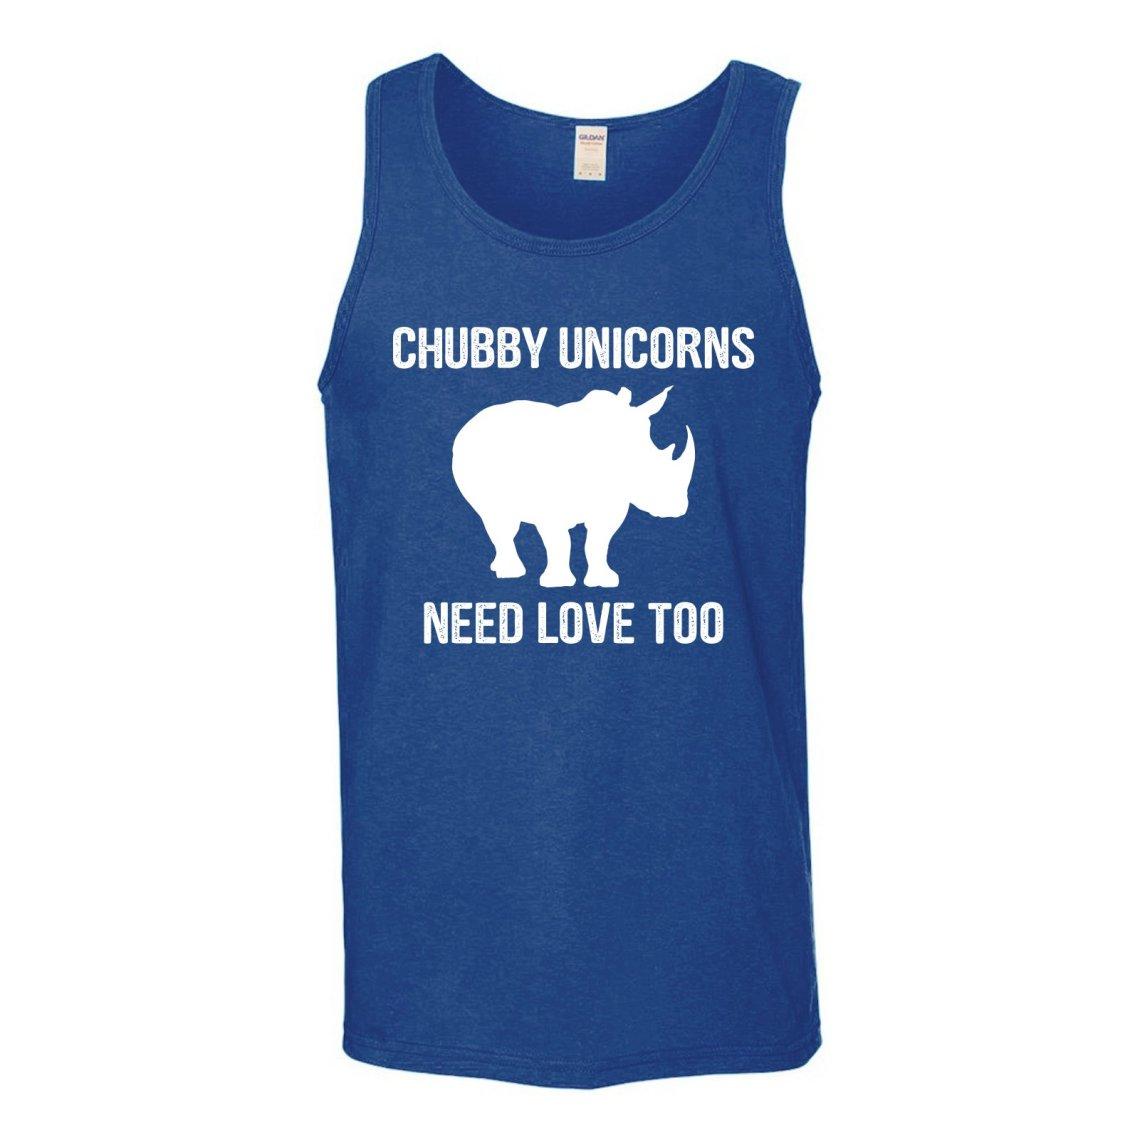 Download Chubby Unicorns Need Love Too Funny Rhino Gym Workout Tank ...